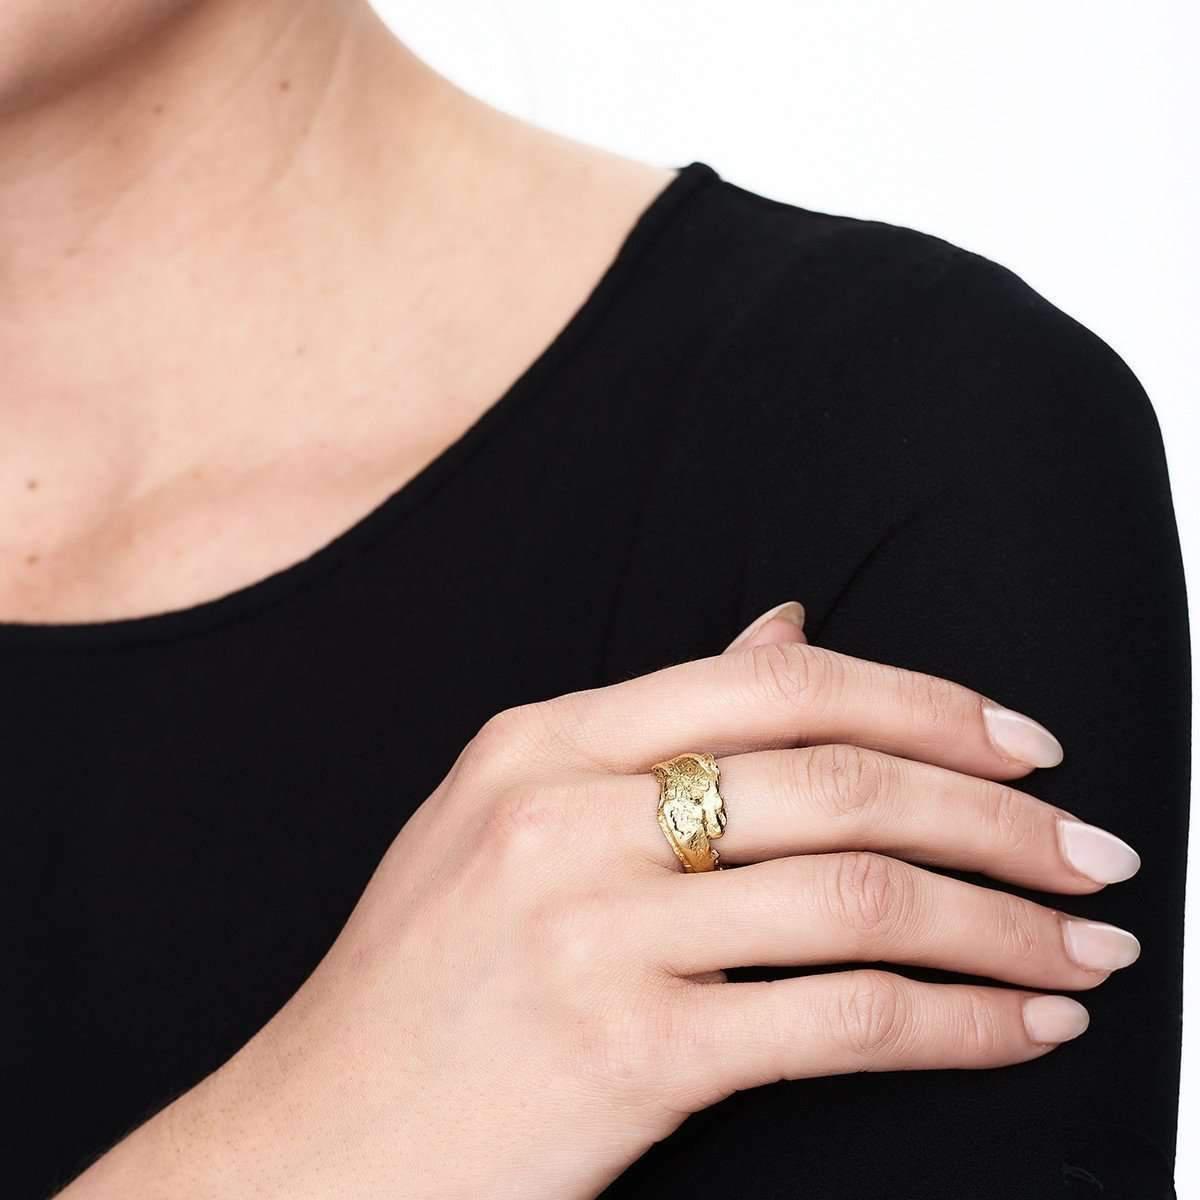 Deborah Blyth Jewellery Rose Gold Wave Bar Ring - UK U - US 10 1/4 - EU 62 3/4 Hl3y0kvC8